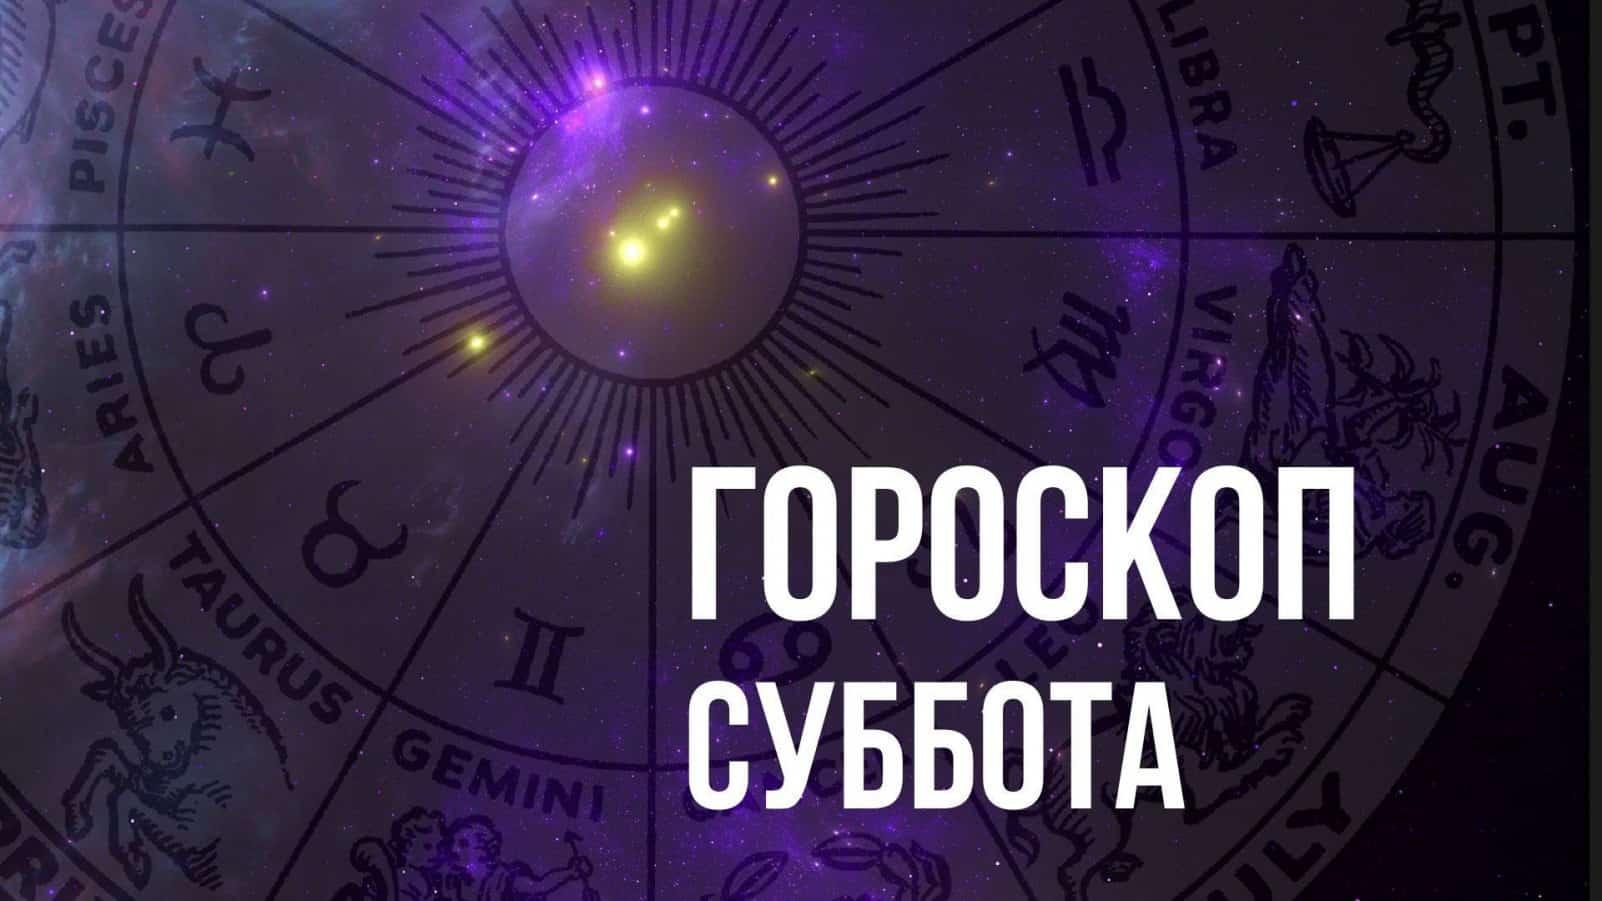 Гороскоп на субботу 7 августа для каждого знака Зодиака